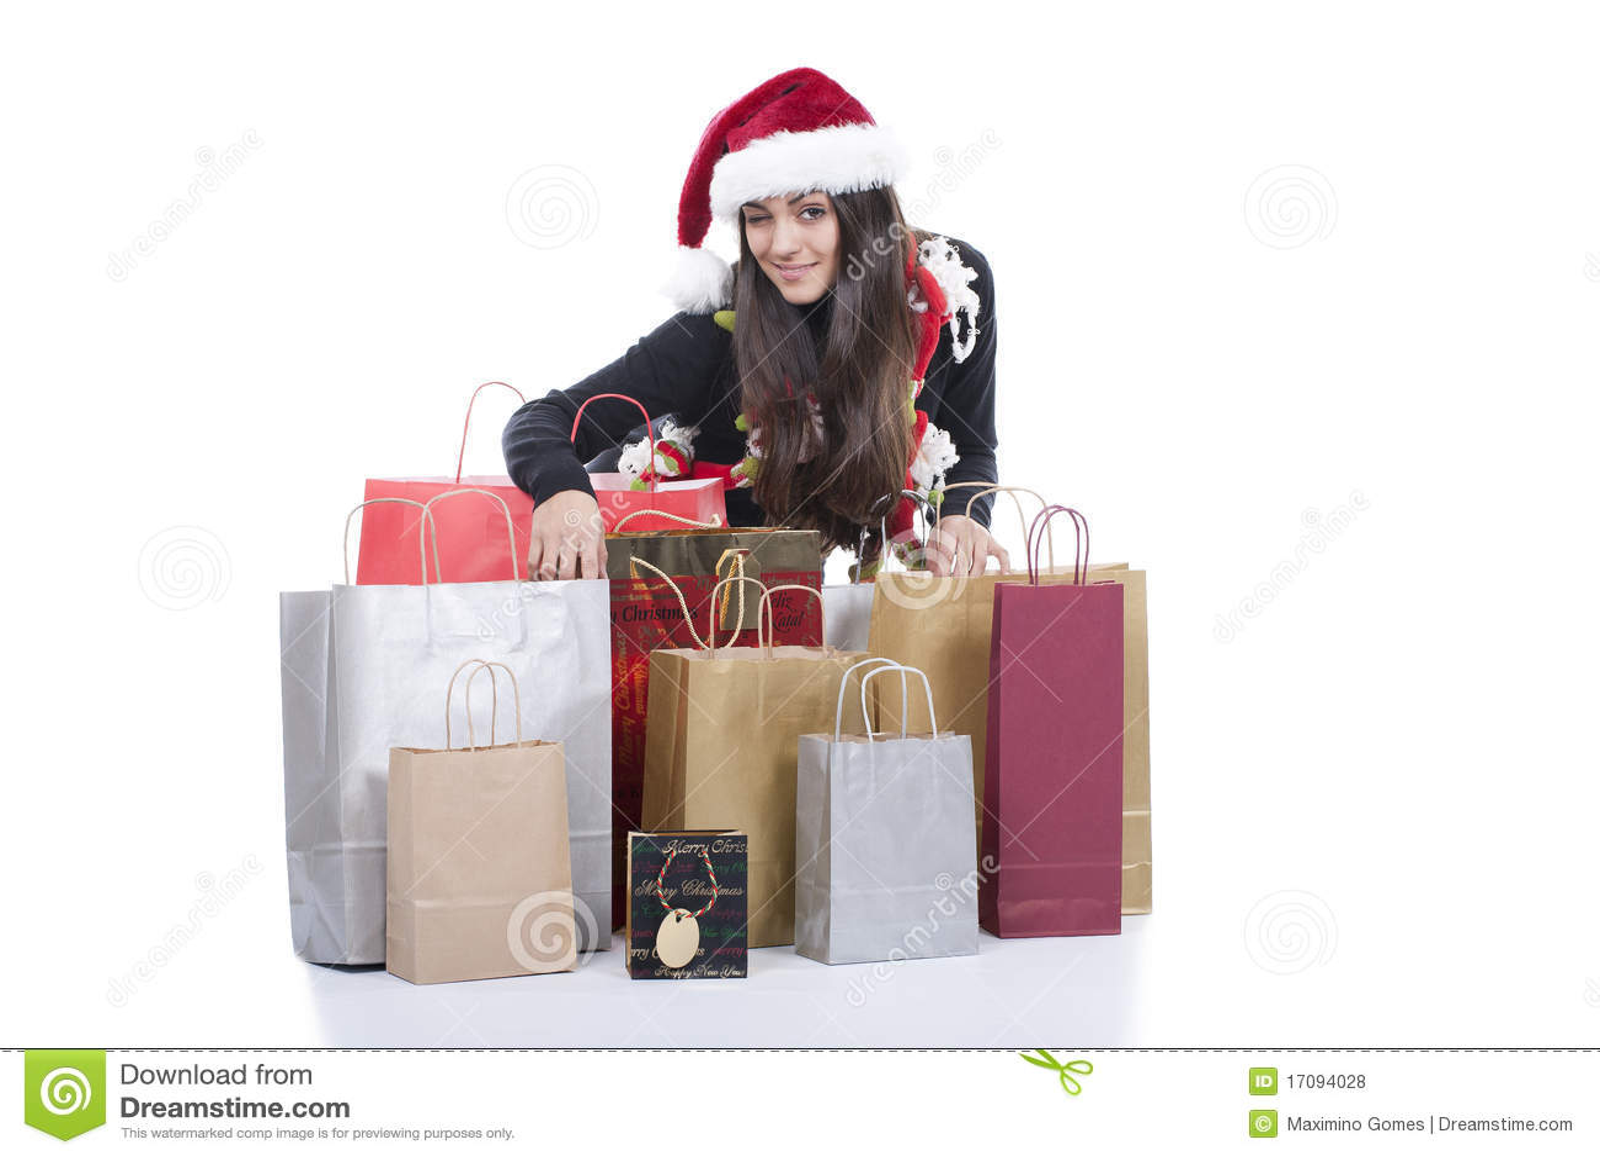 Christmas Shopping Royalty Free Stock Photos Image 17094028